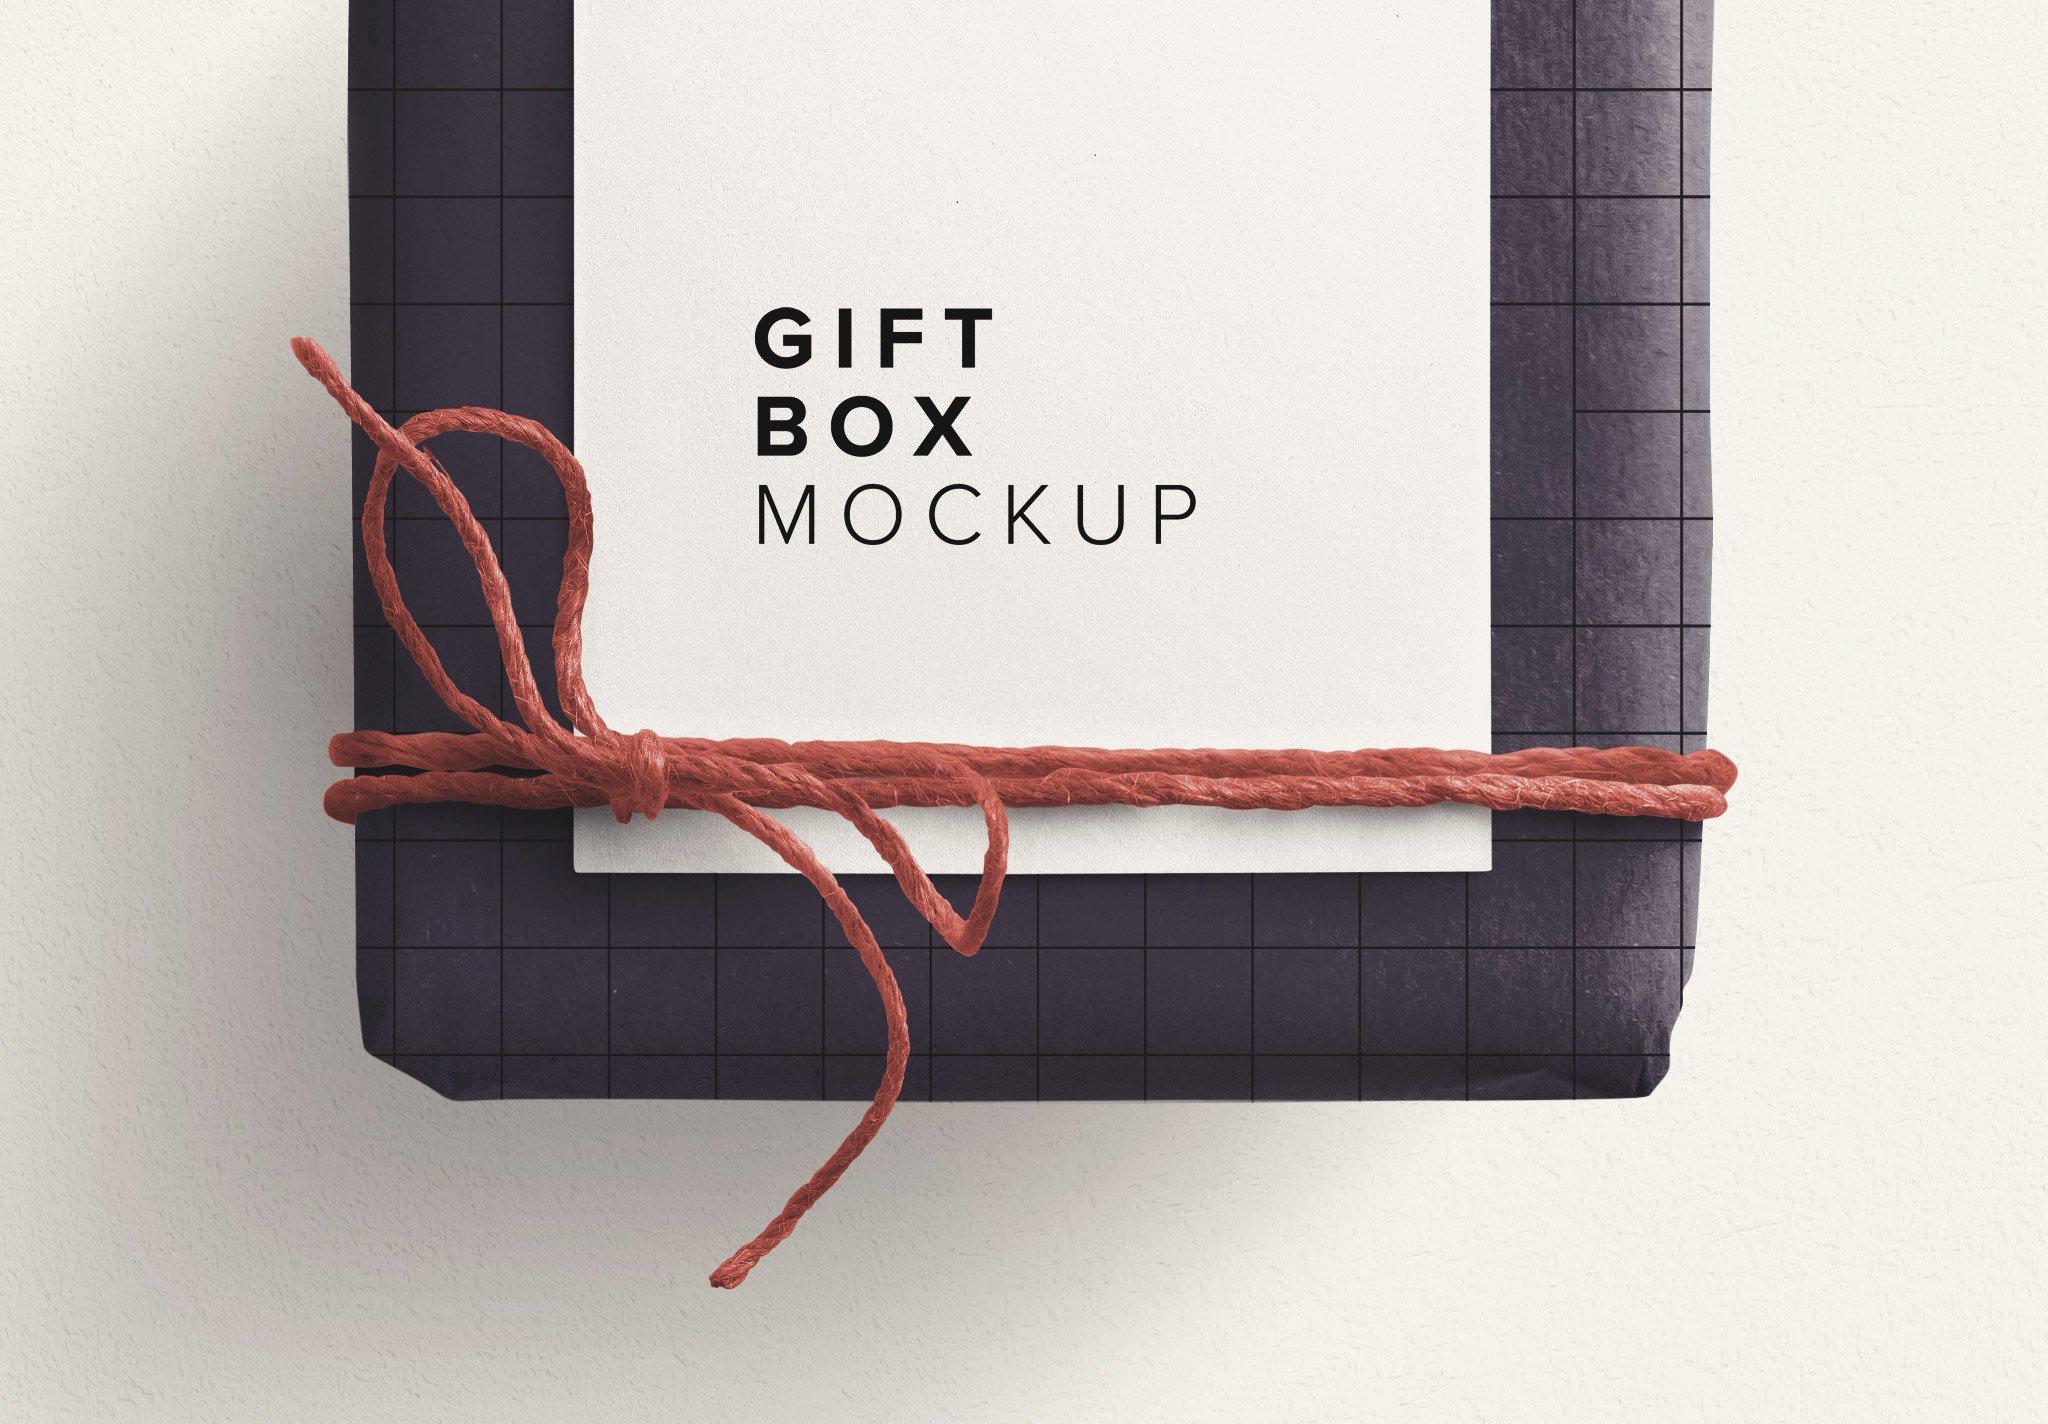 gift box mockup w twine n gift tag image03